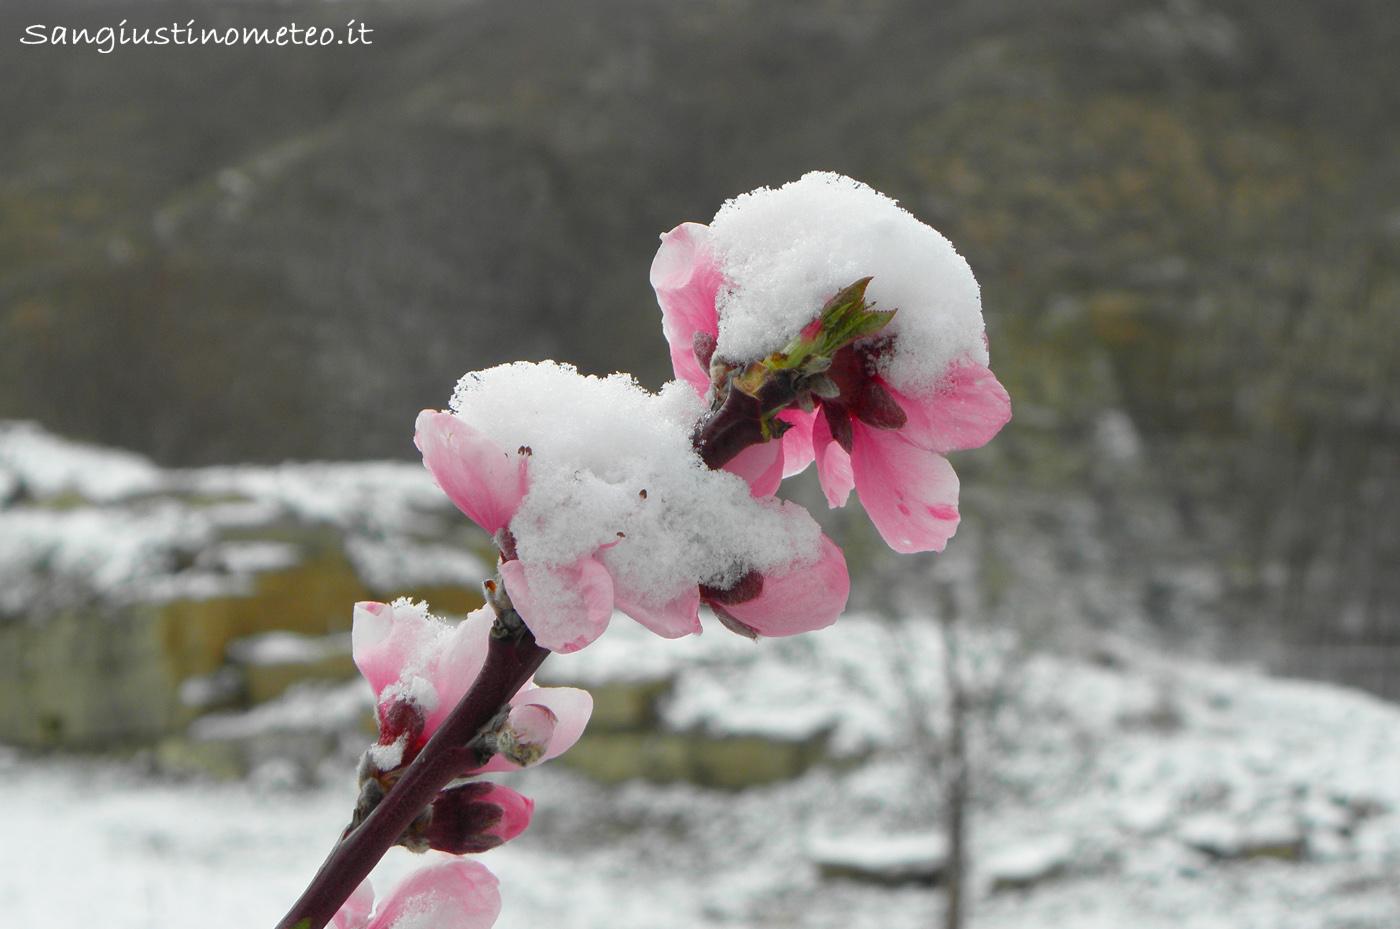 Neve 7 Aprile 2015 San Giustino pesco fiorito